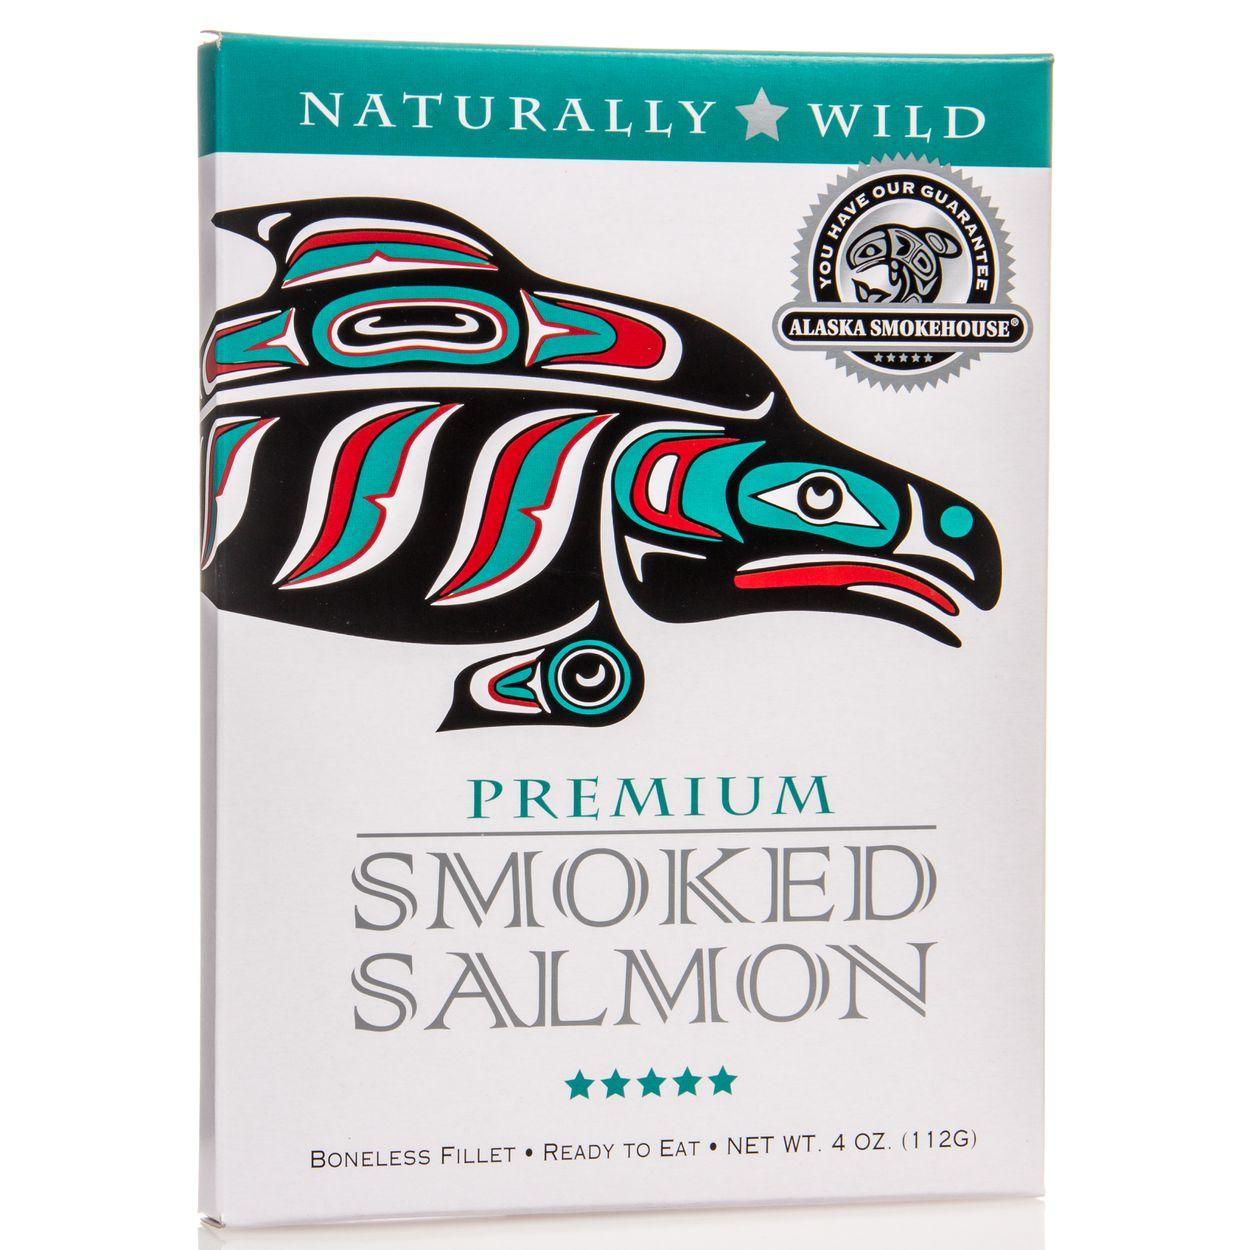 Alaska Smokehouse - Smoked Salmon